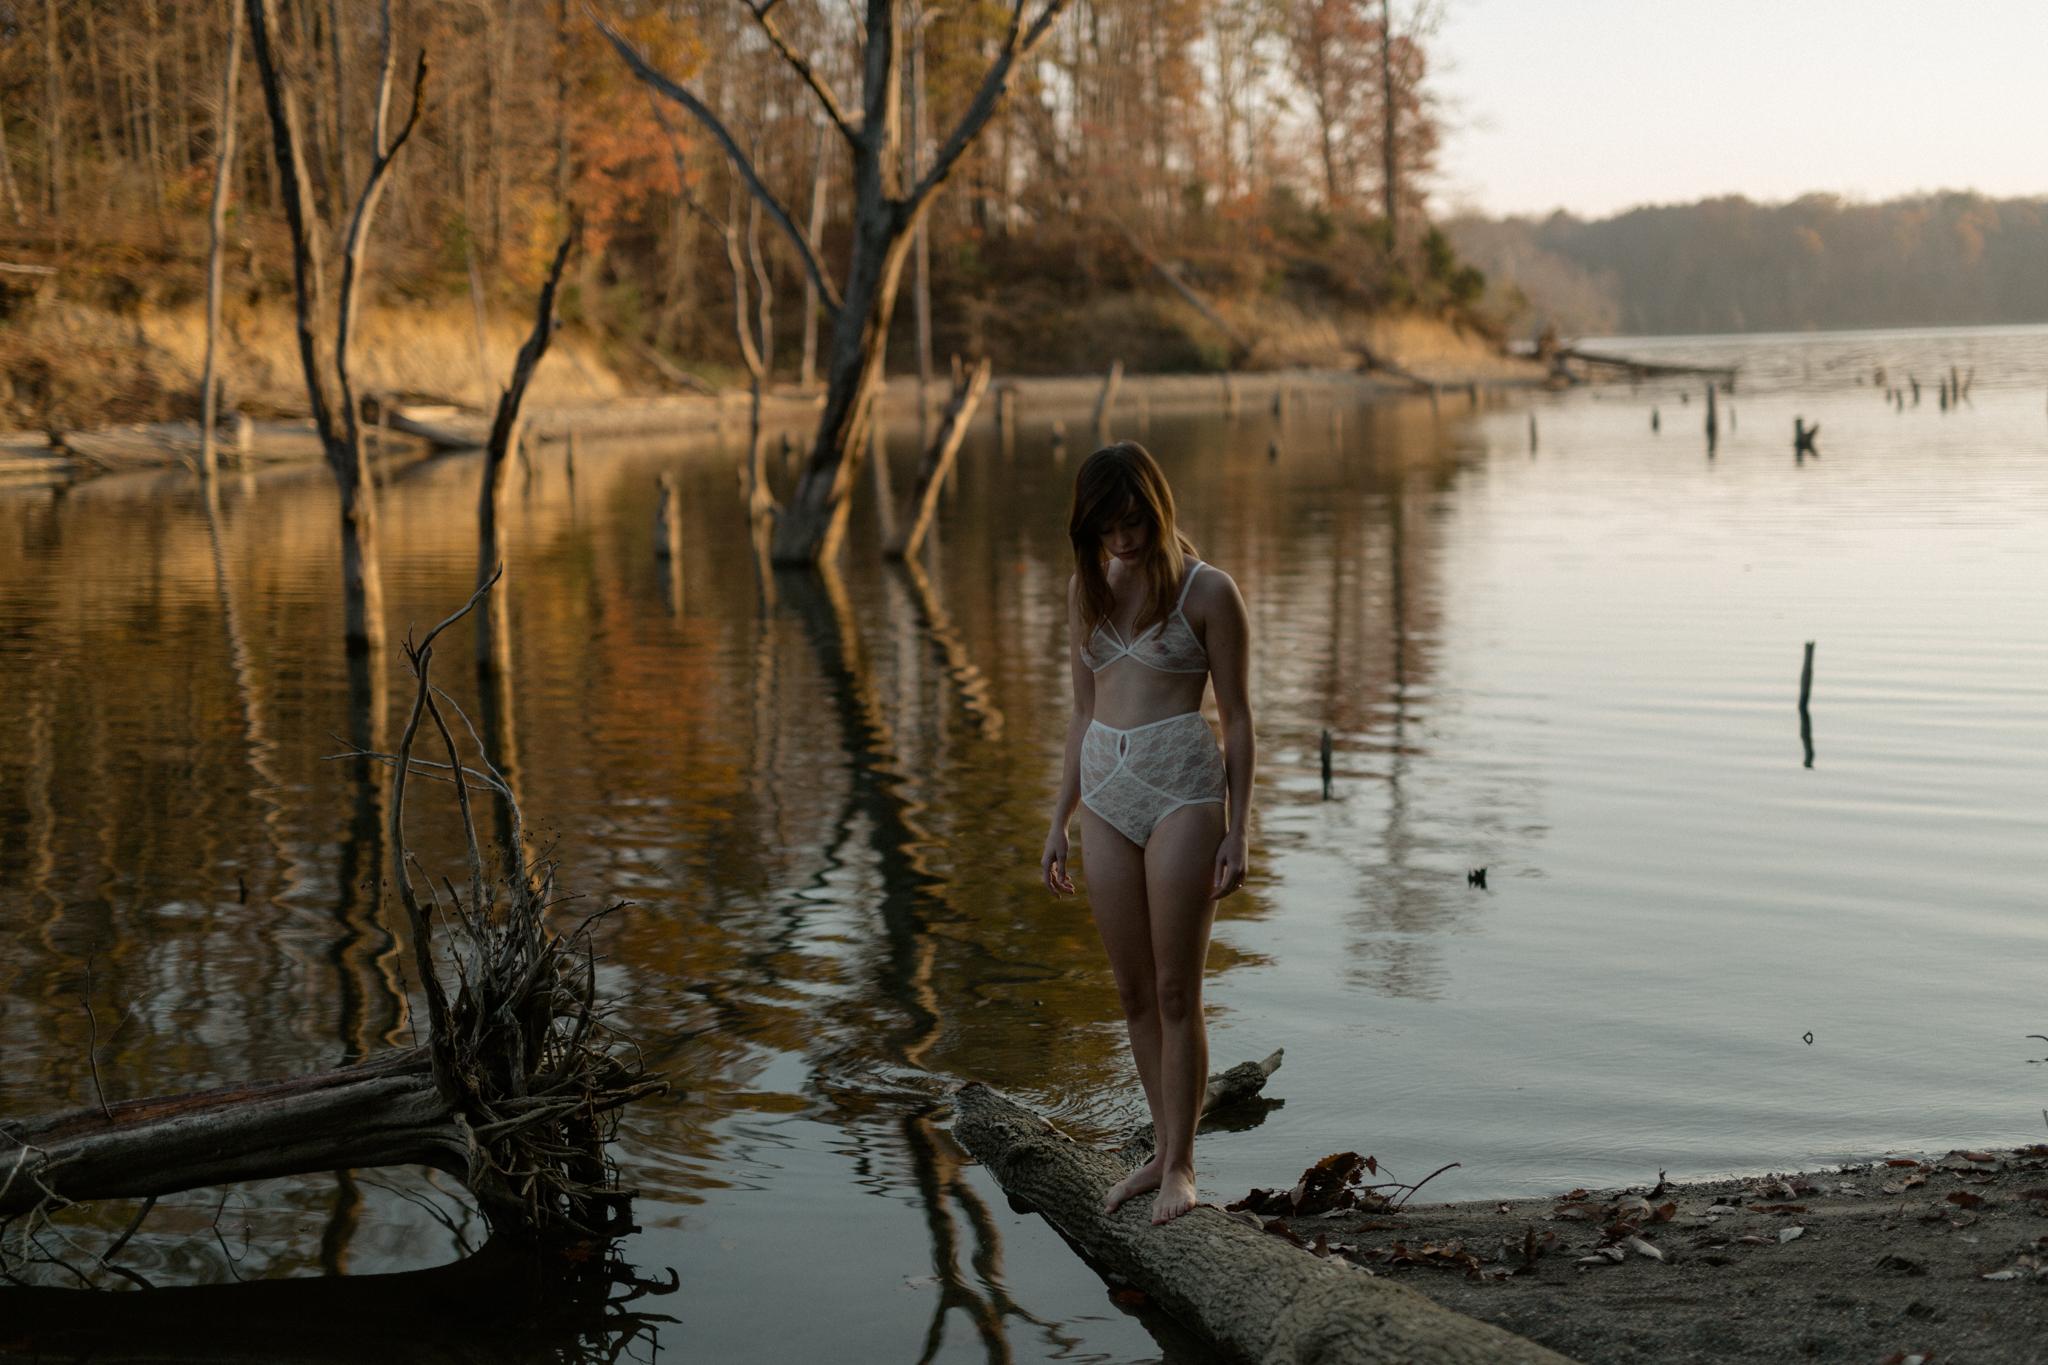 nahina lingerie editorial by sarah rose iamsarahrose in columbus ohio cincinnati ohio dayton ohio